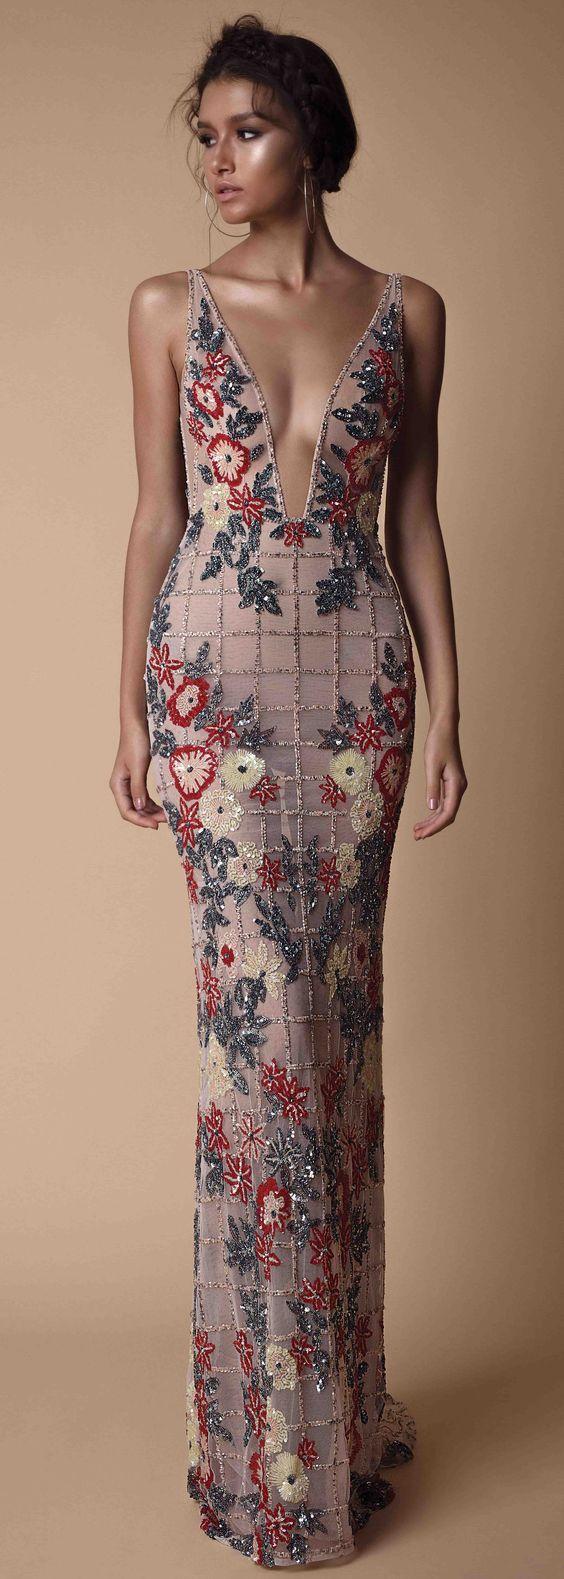 best grad dresses images on pinterest high fashion